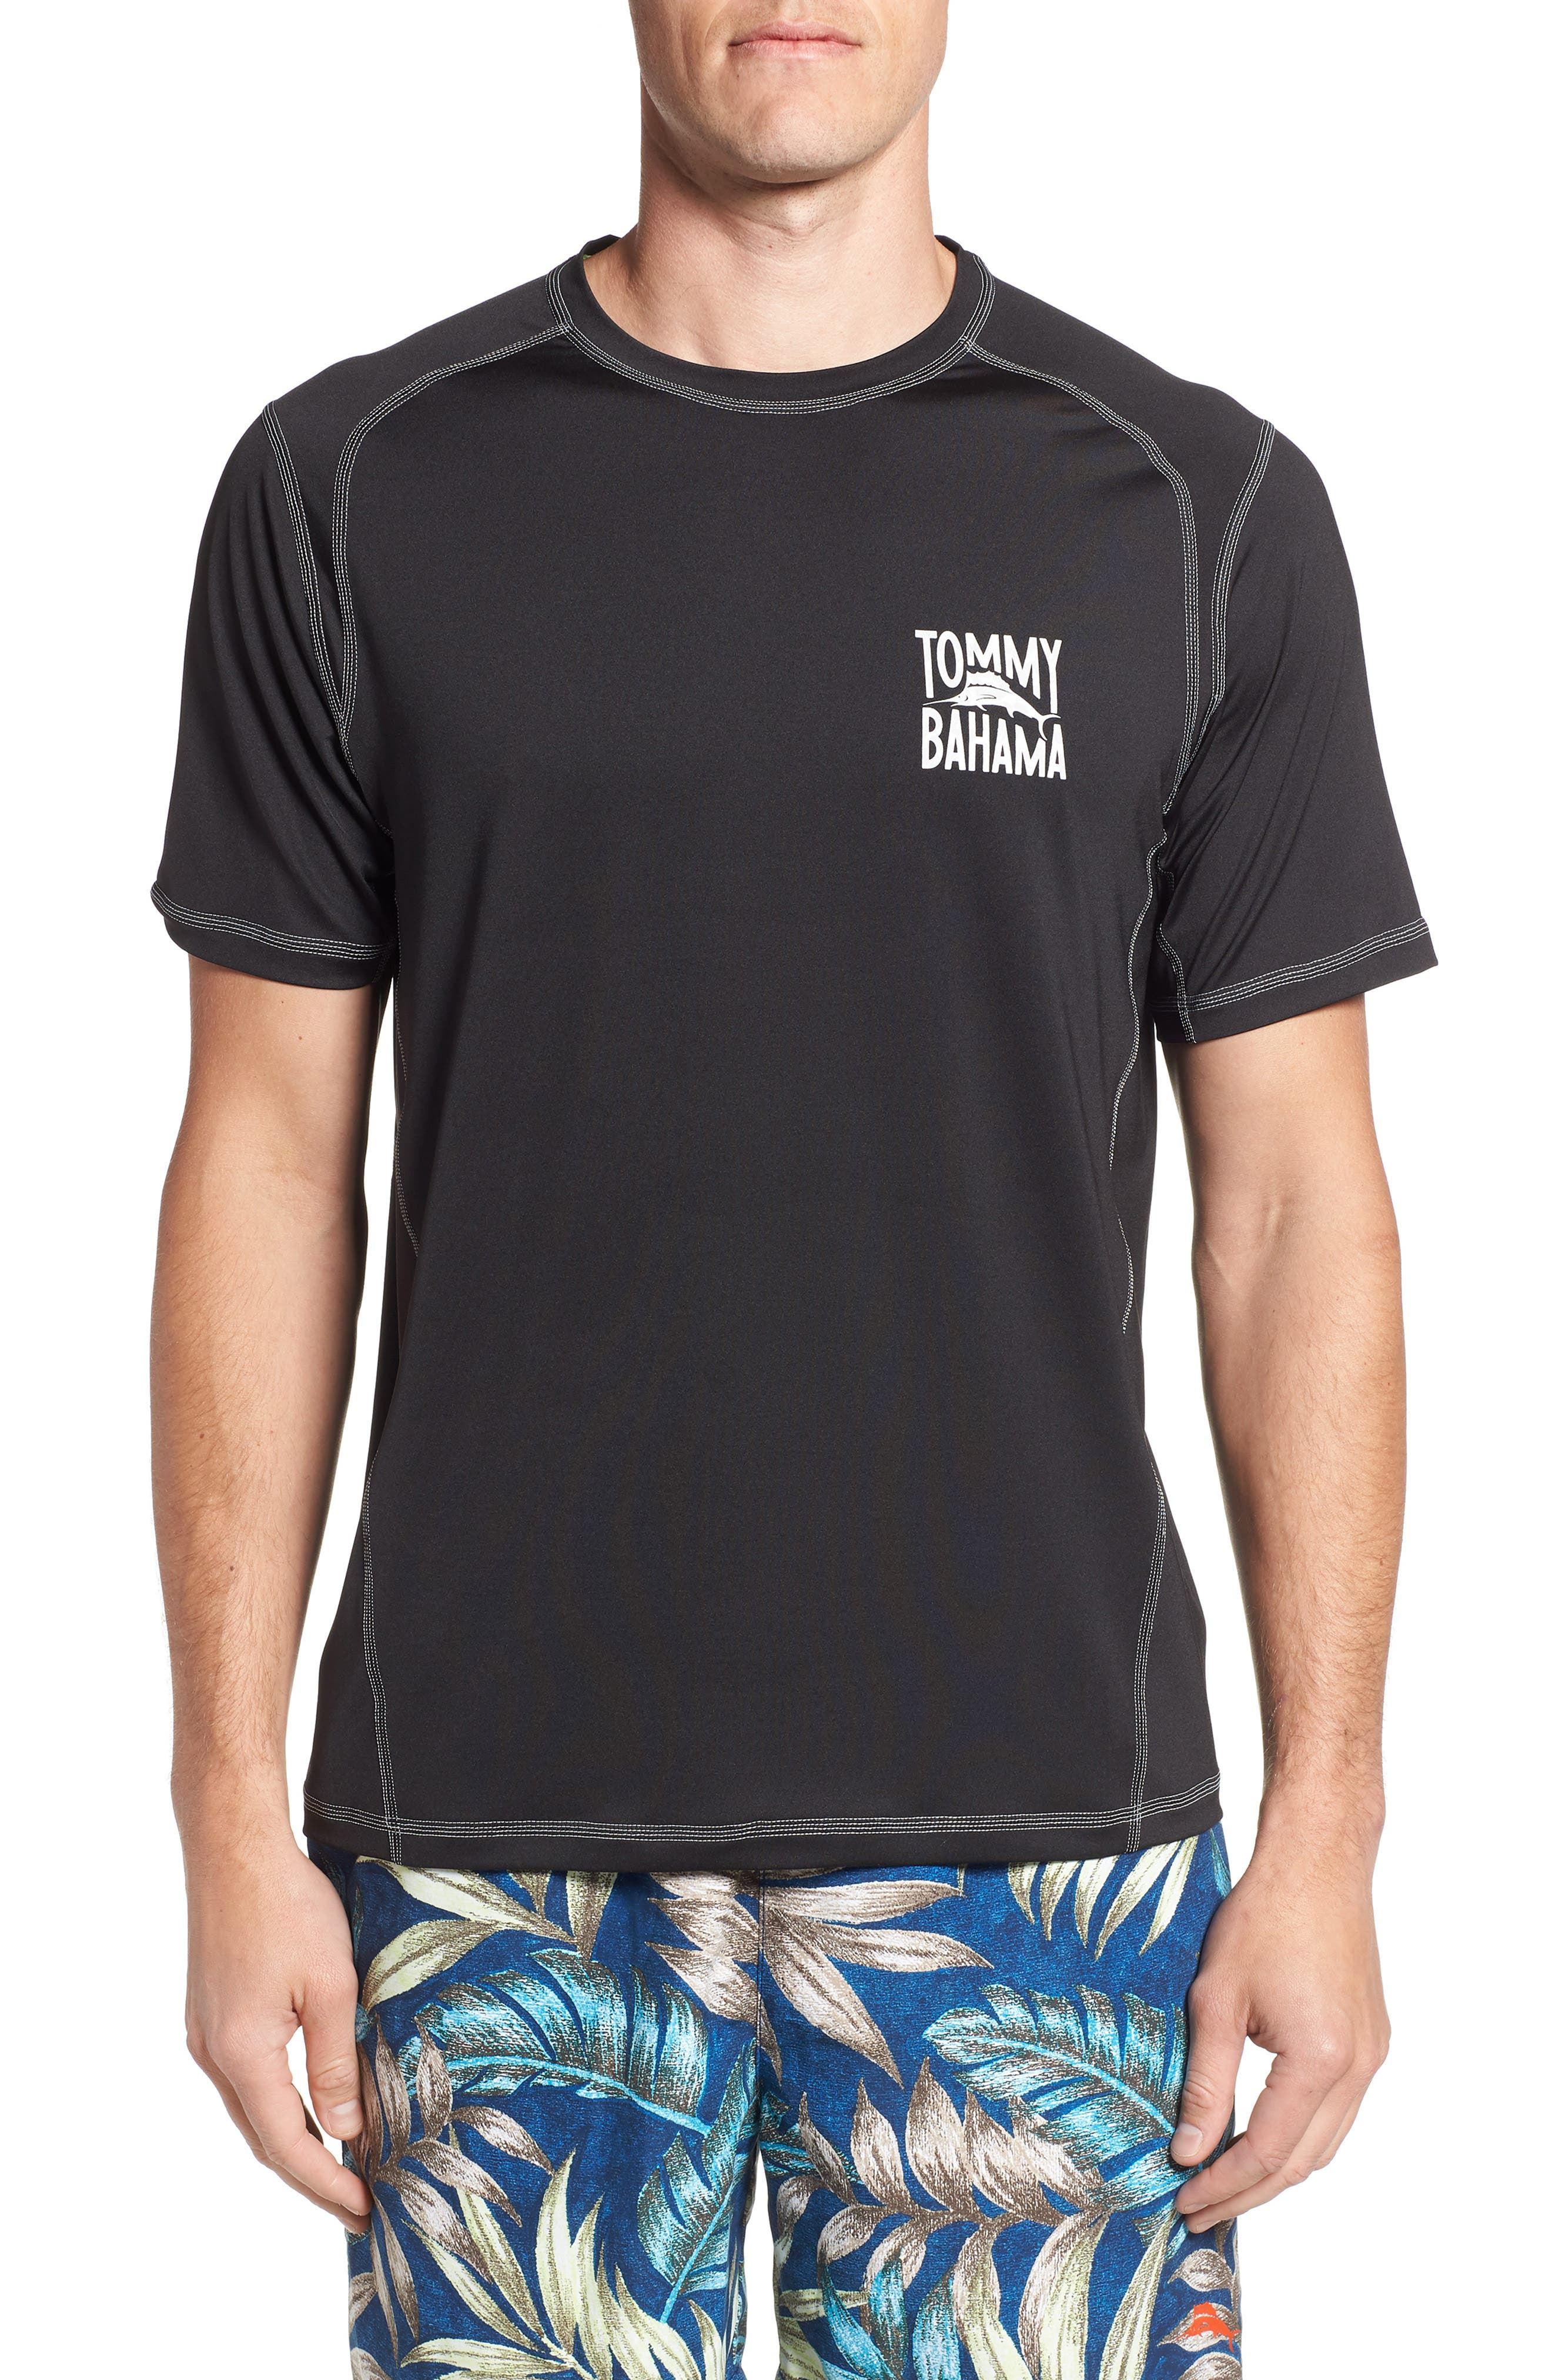 IslandActive<sup>™</sup> Beach Pro Rashguard T-Shirt,                             Main thumbnail 1, color,                             BLACK